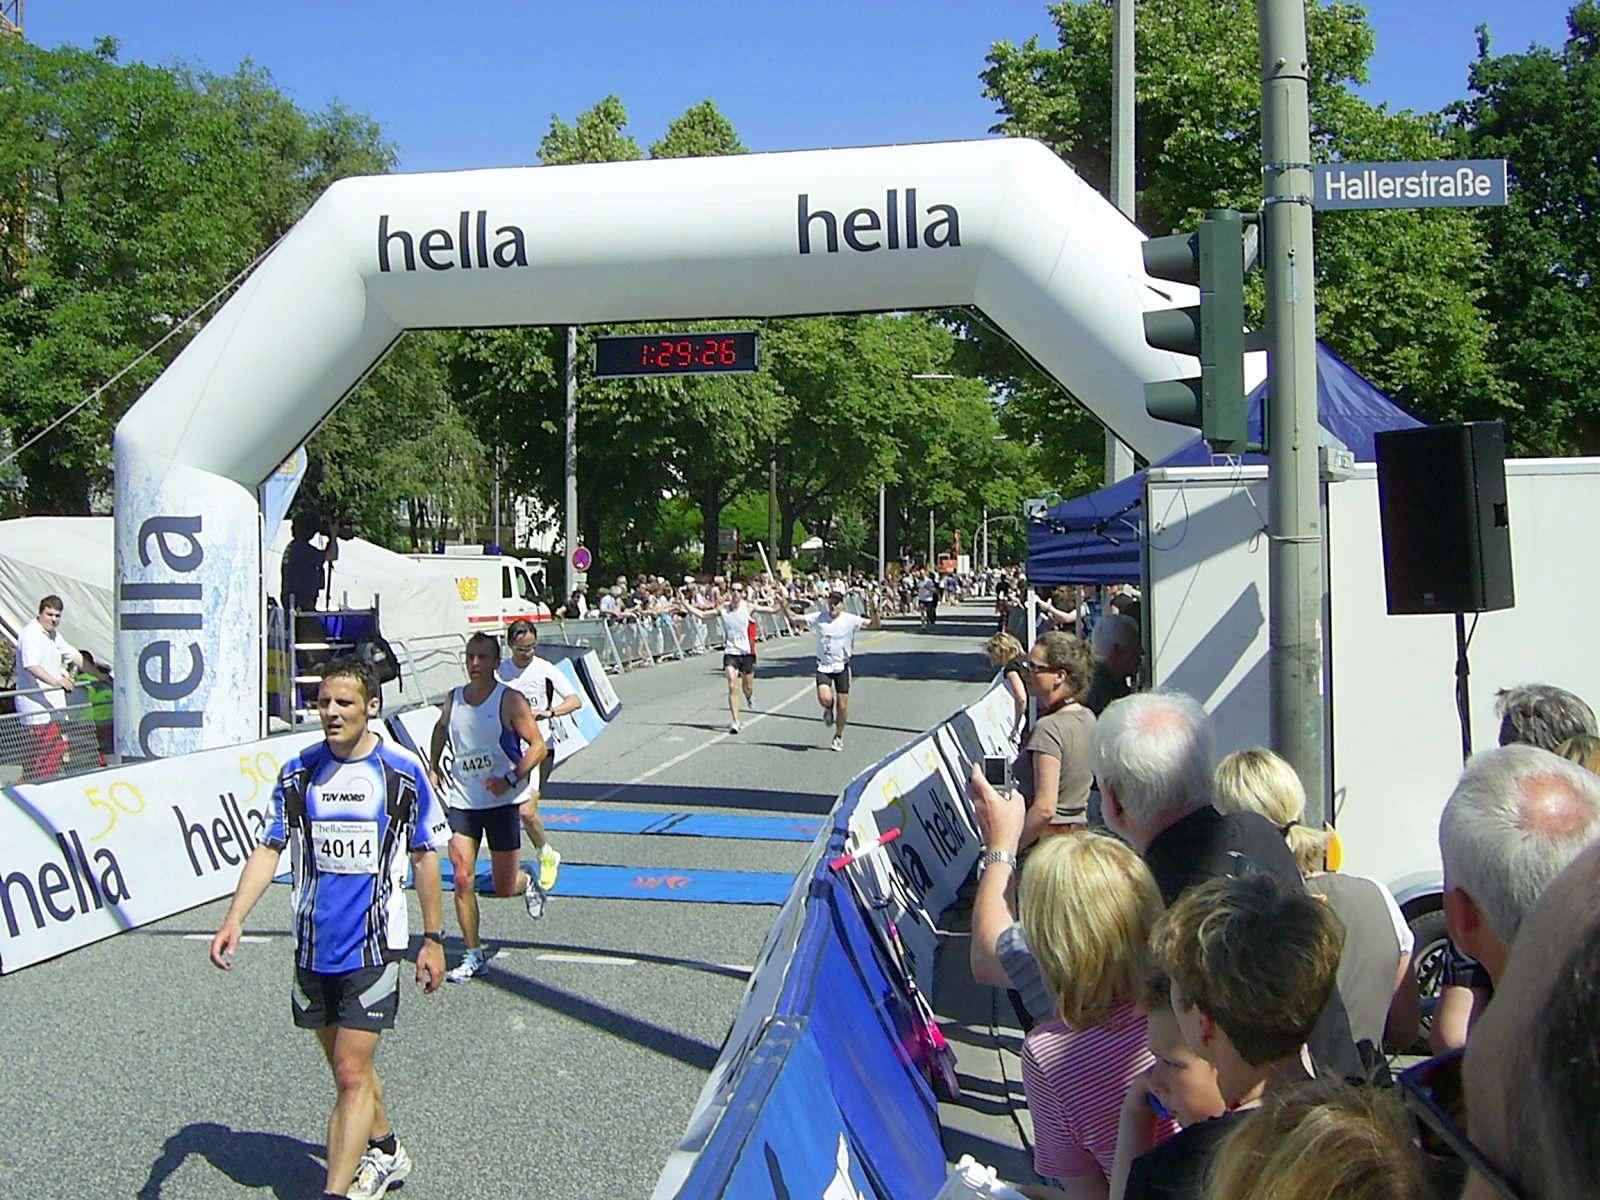 16. hella Halbmarathon 2010: Zieleinlauf DirkBIETKE, 102., Jens GÖBEL, 107., Alan WOO, 108., Rolf DREXHAGE, 109., Thomas KRAUSE-ABLASS, 110.